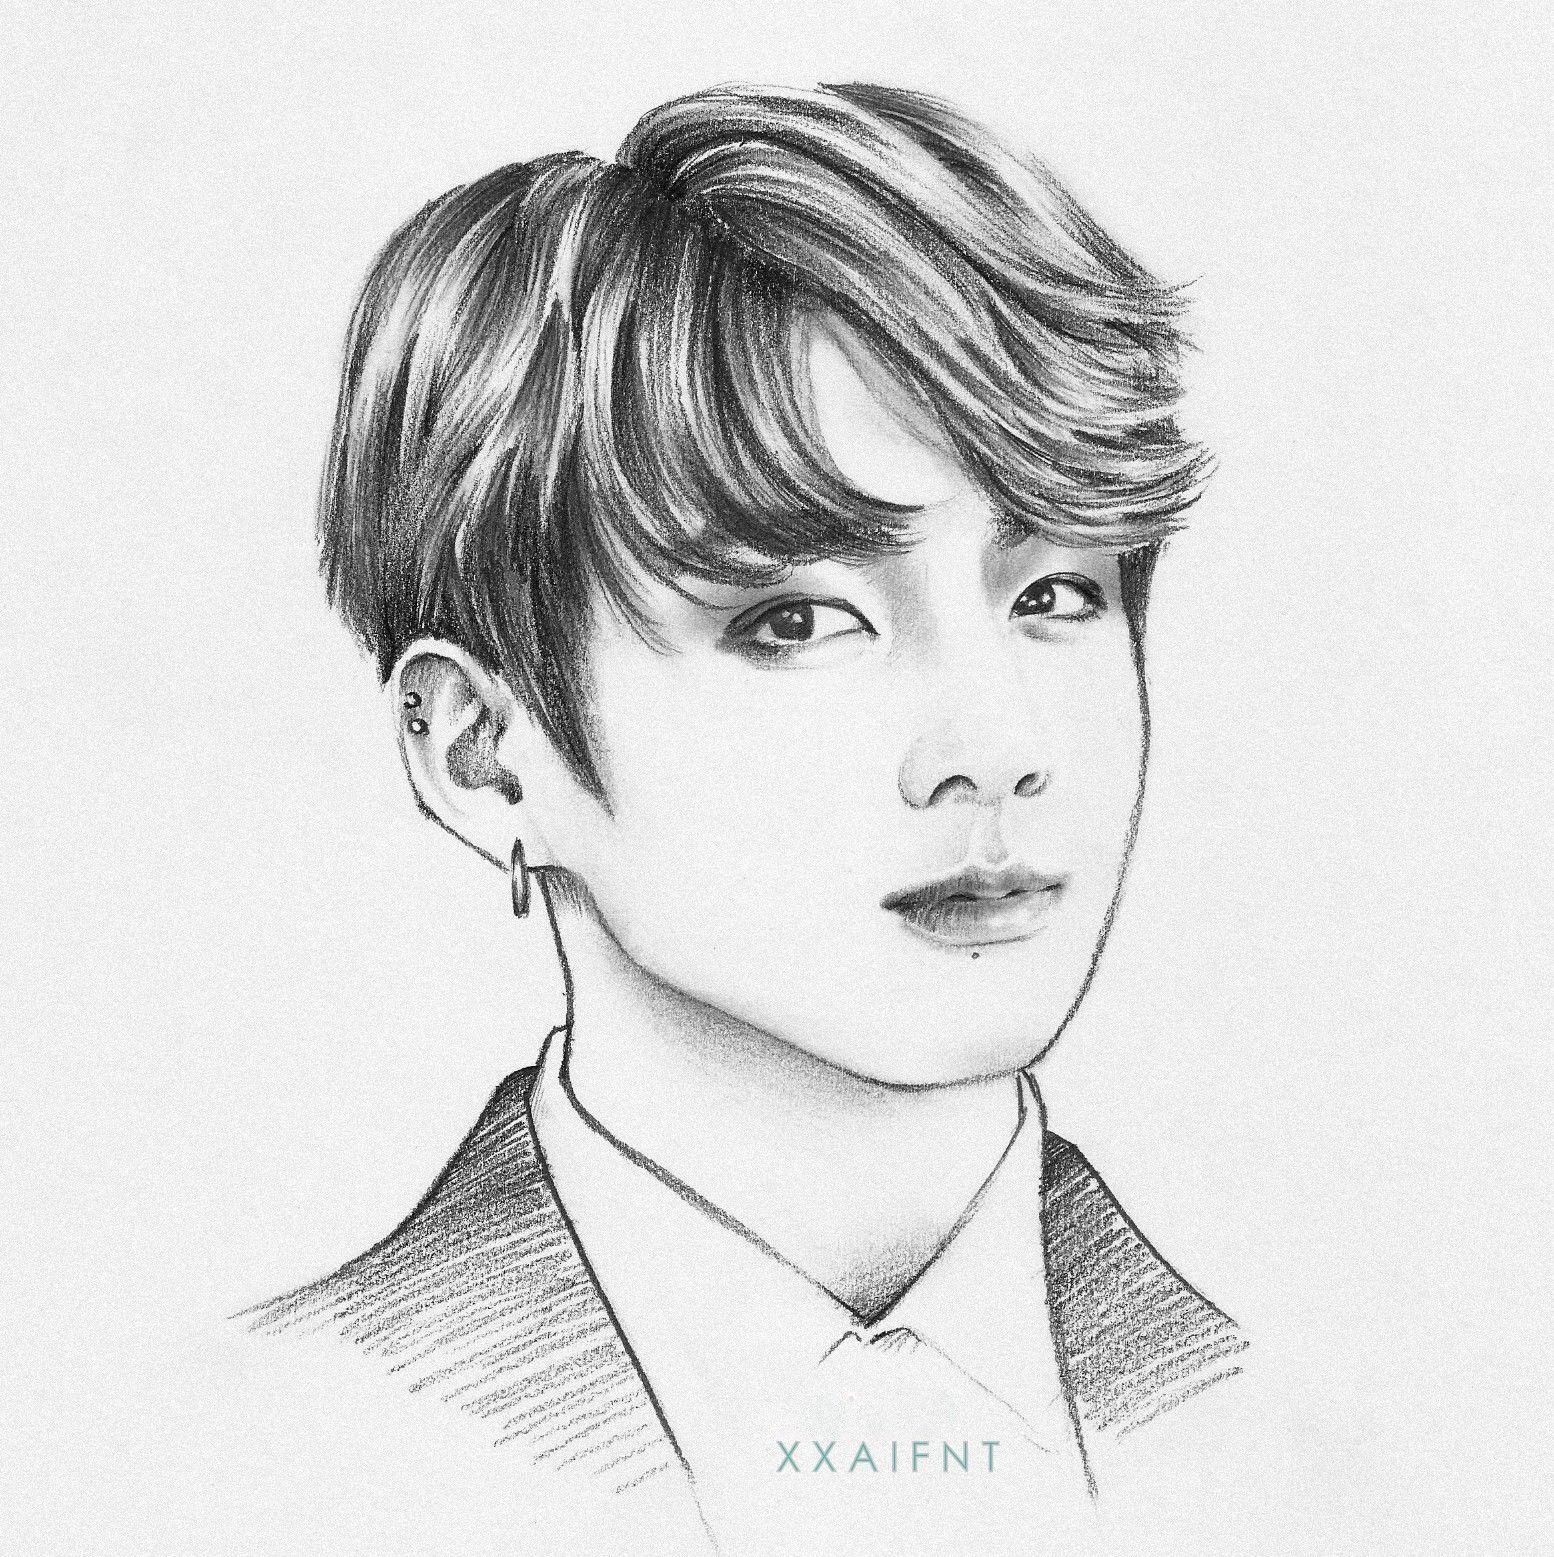 Jungkook Bts Drawings: Jeon Jungkook Fanart